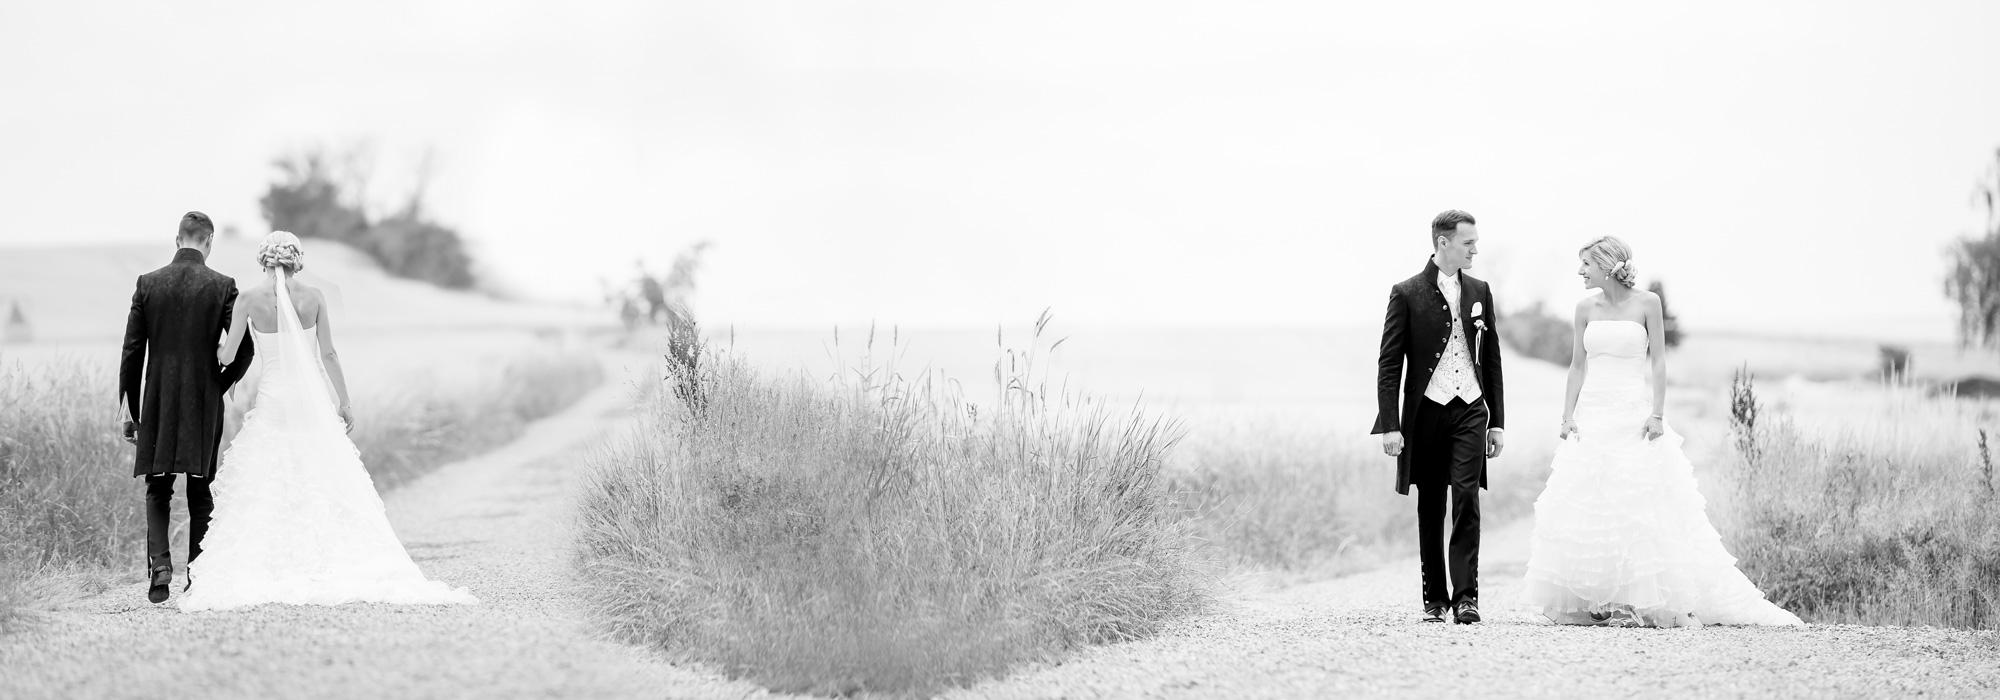 Fotobuch-Cover-Hochzeit-web